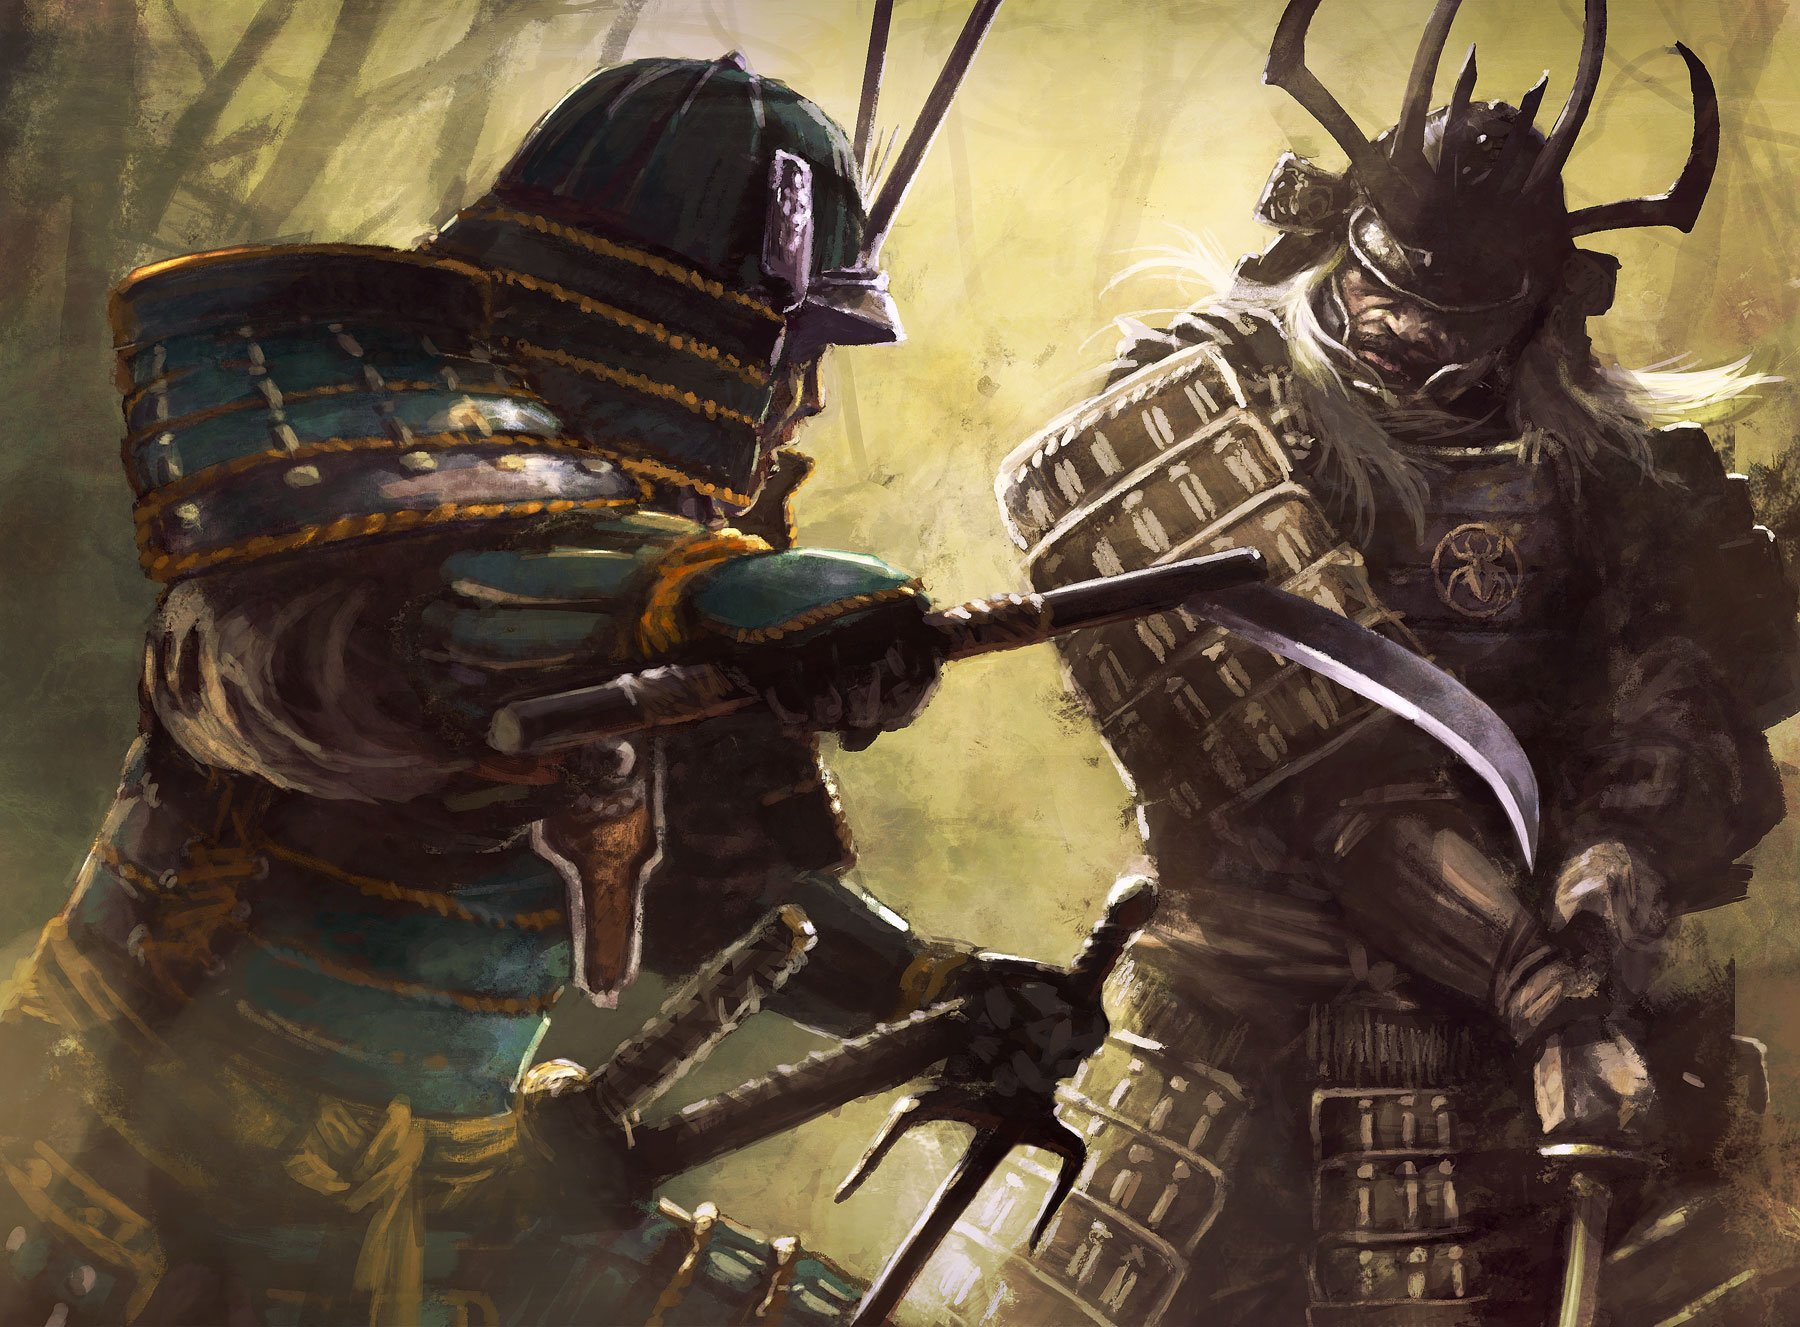 SAMURAI Samurai Samurai Tattoo and Samurai Armor 1800x1327